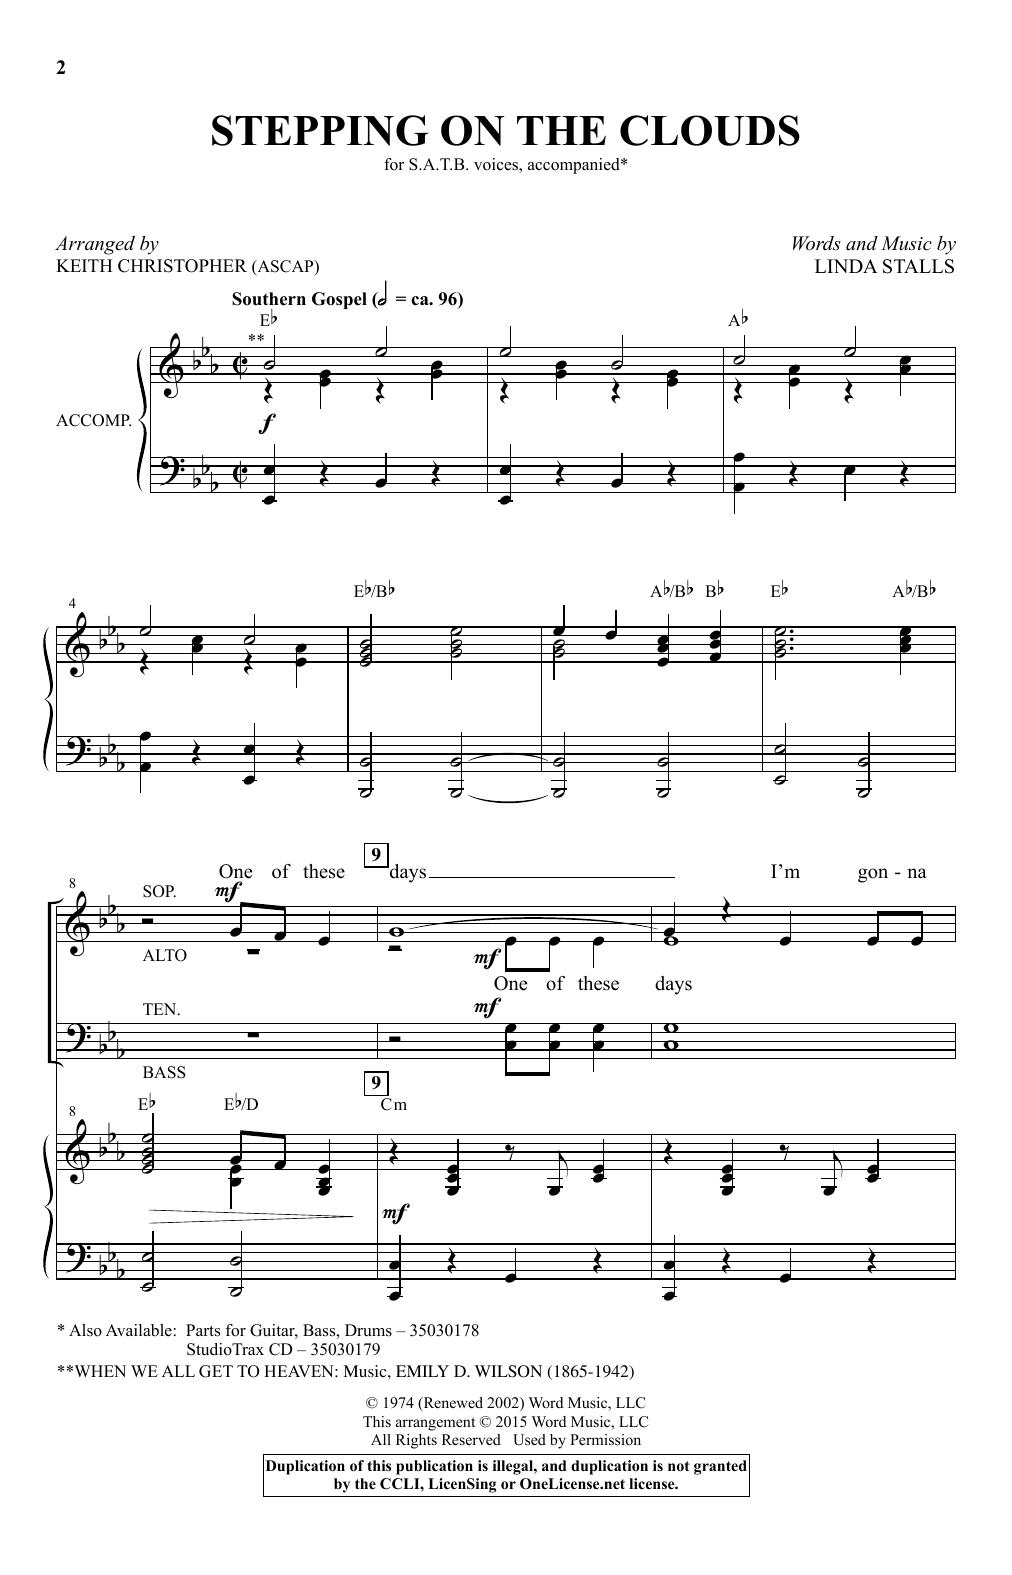 Sheet Music Digital Files To Print Licensed Linda Stalls Digital